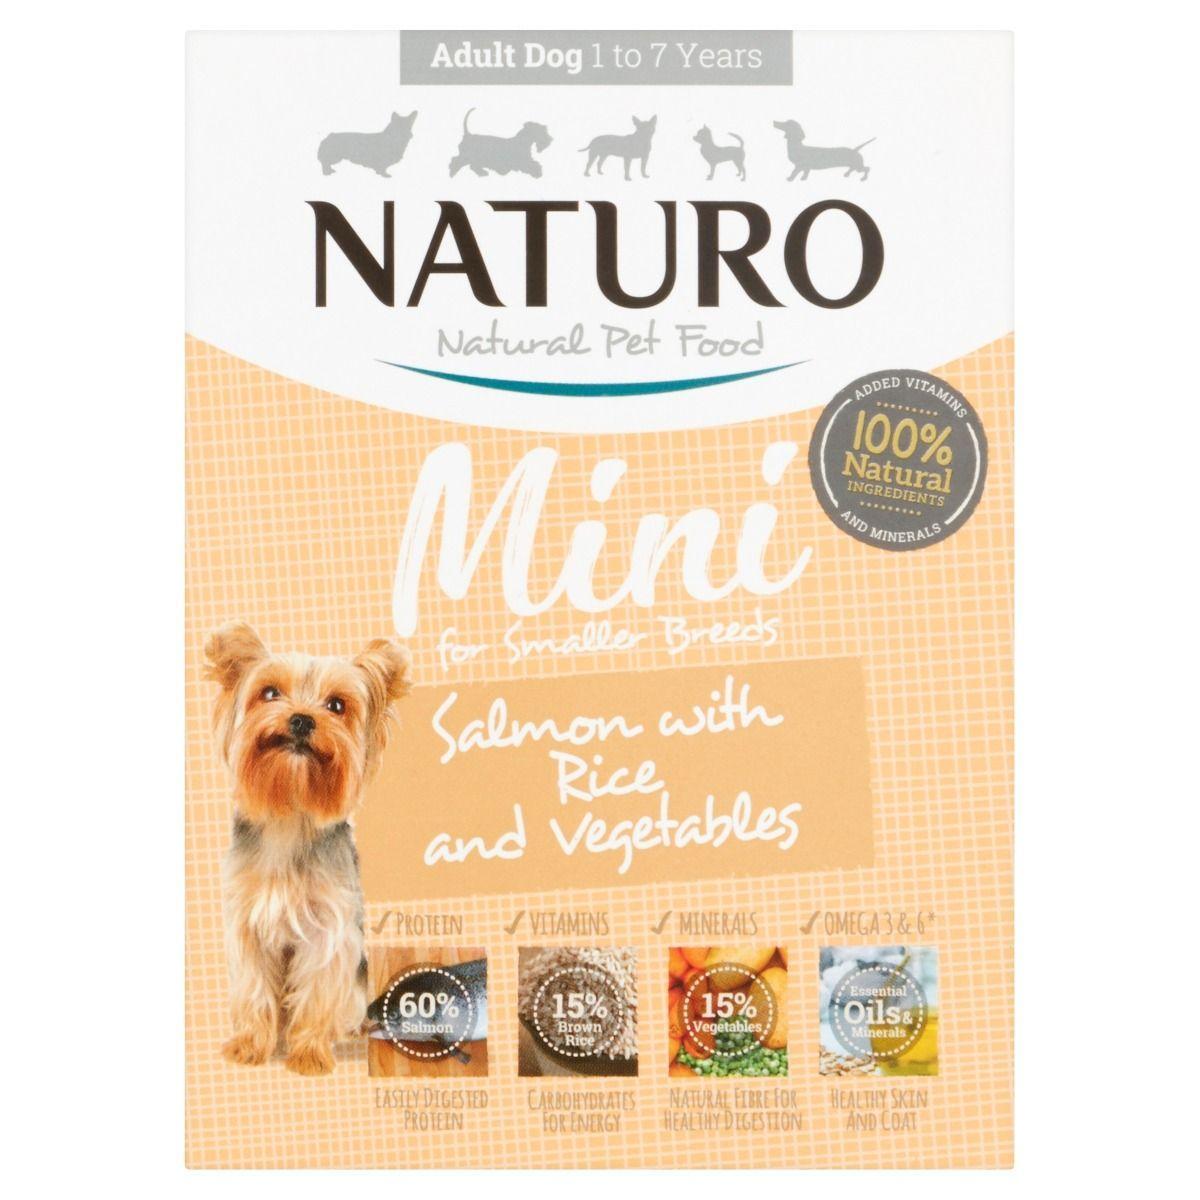 Naturo Mini Salmon with Rice & Vegetables Wet Dog Food, 150-gram